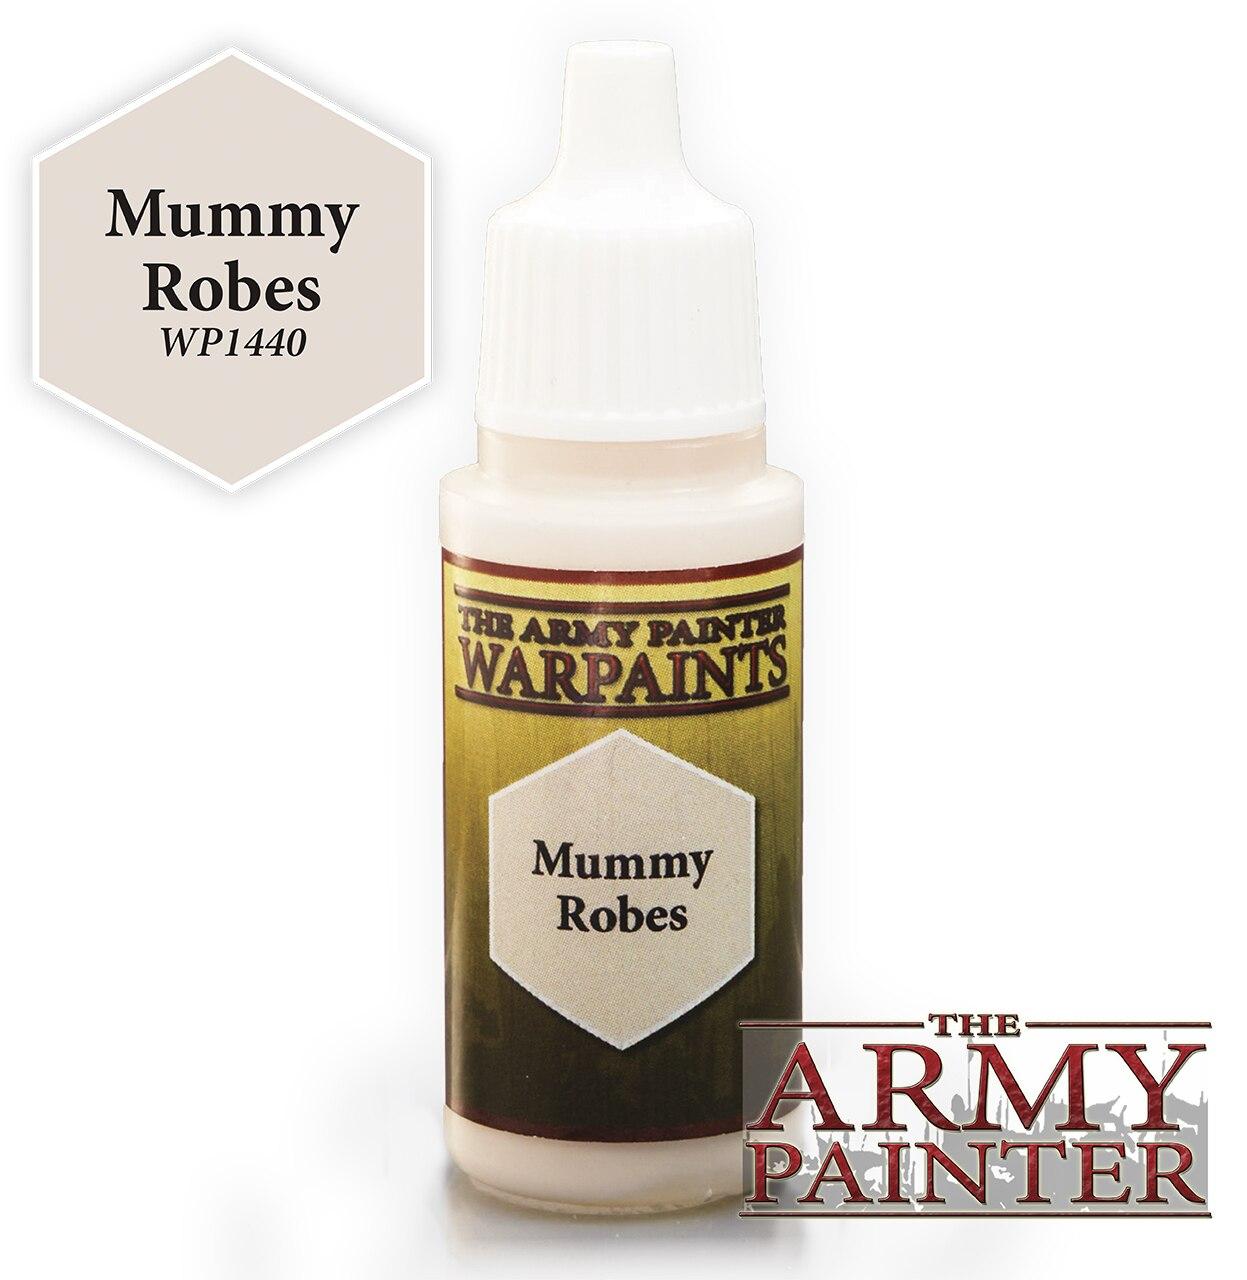 Army Painter Warpaint - Mummy Robes